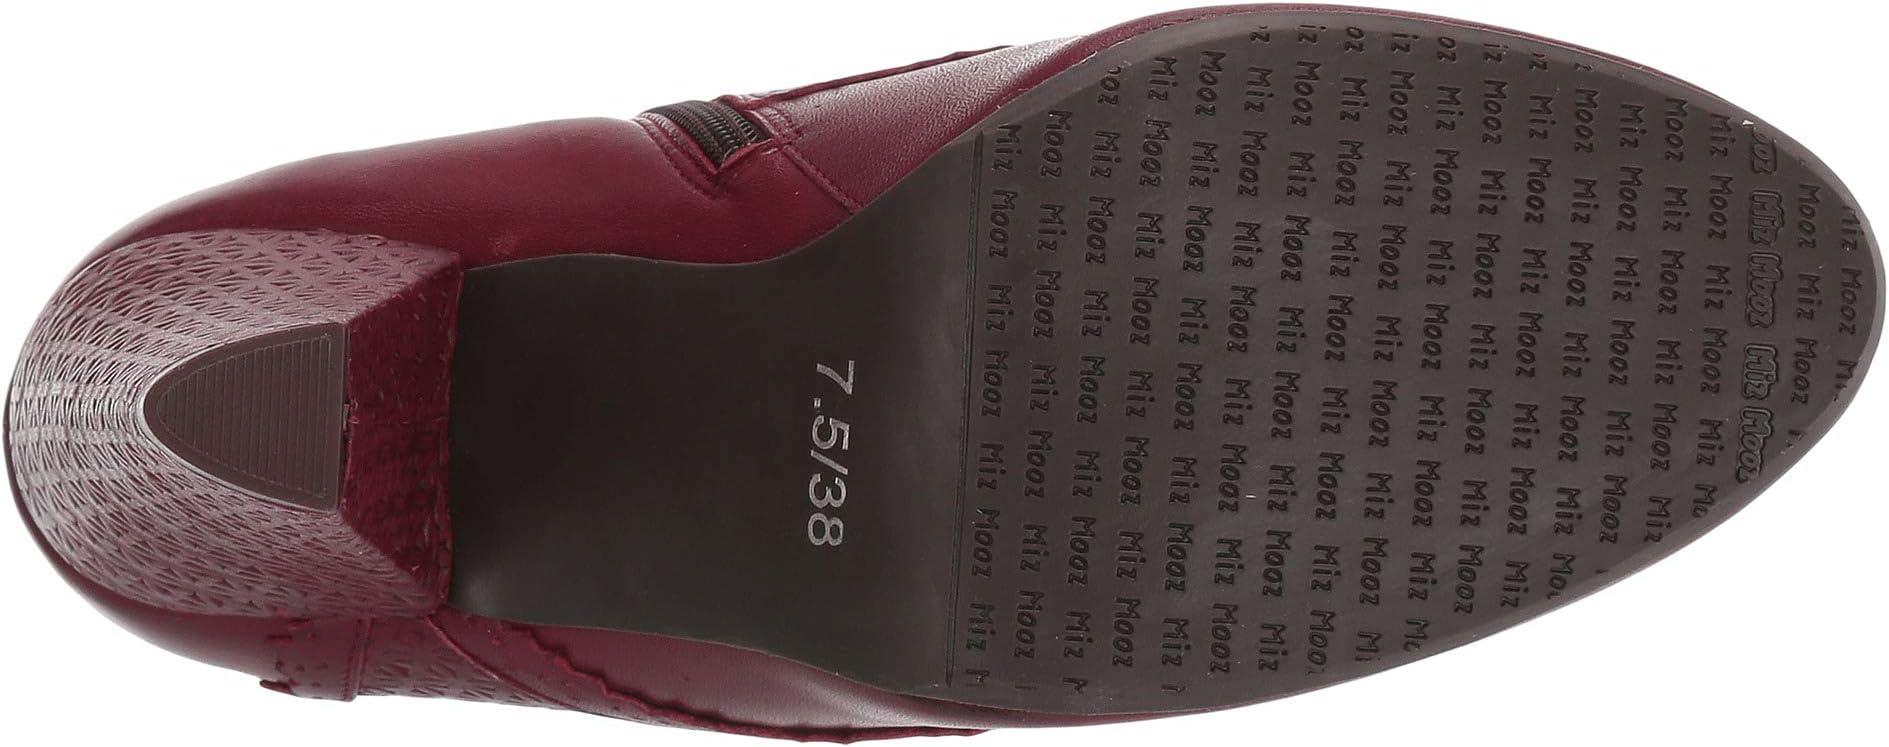 Miz Mooz Channing | Women's shoes | 2020 Newest